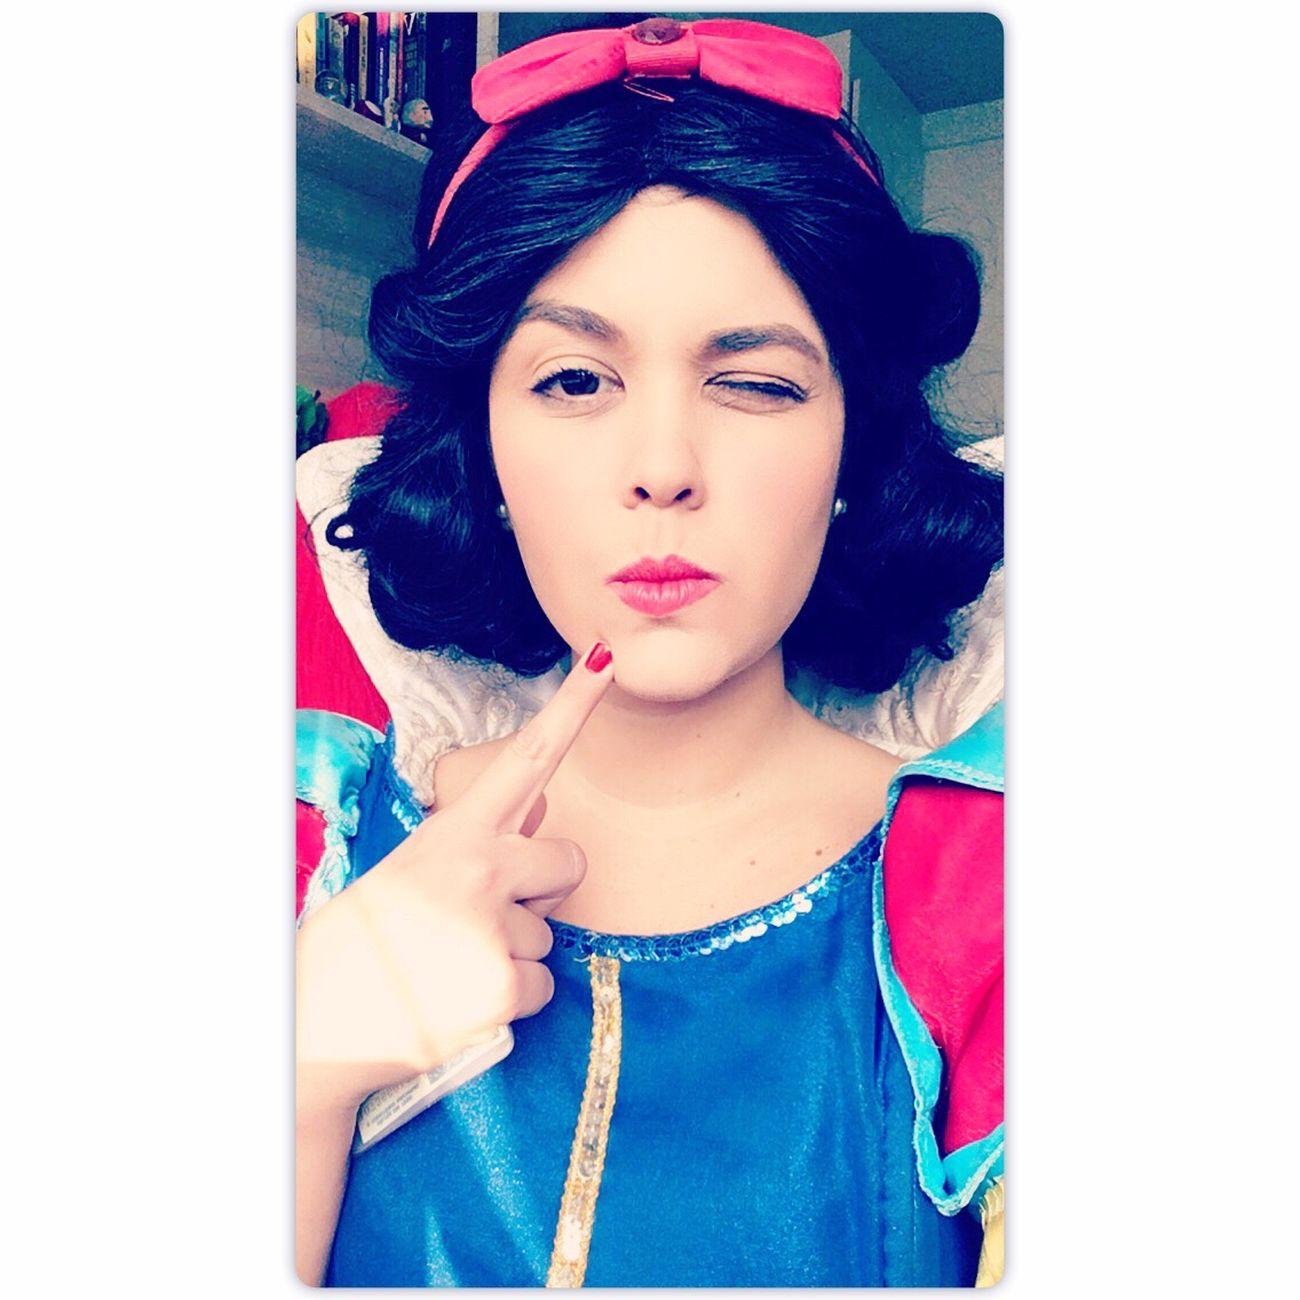 Snowwhite Princess Disney Disneyprincess Amazing Fantasy Sharinglove Brazil Love AmazingSunday